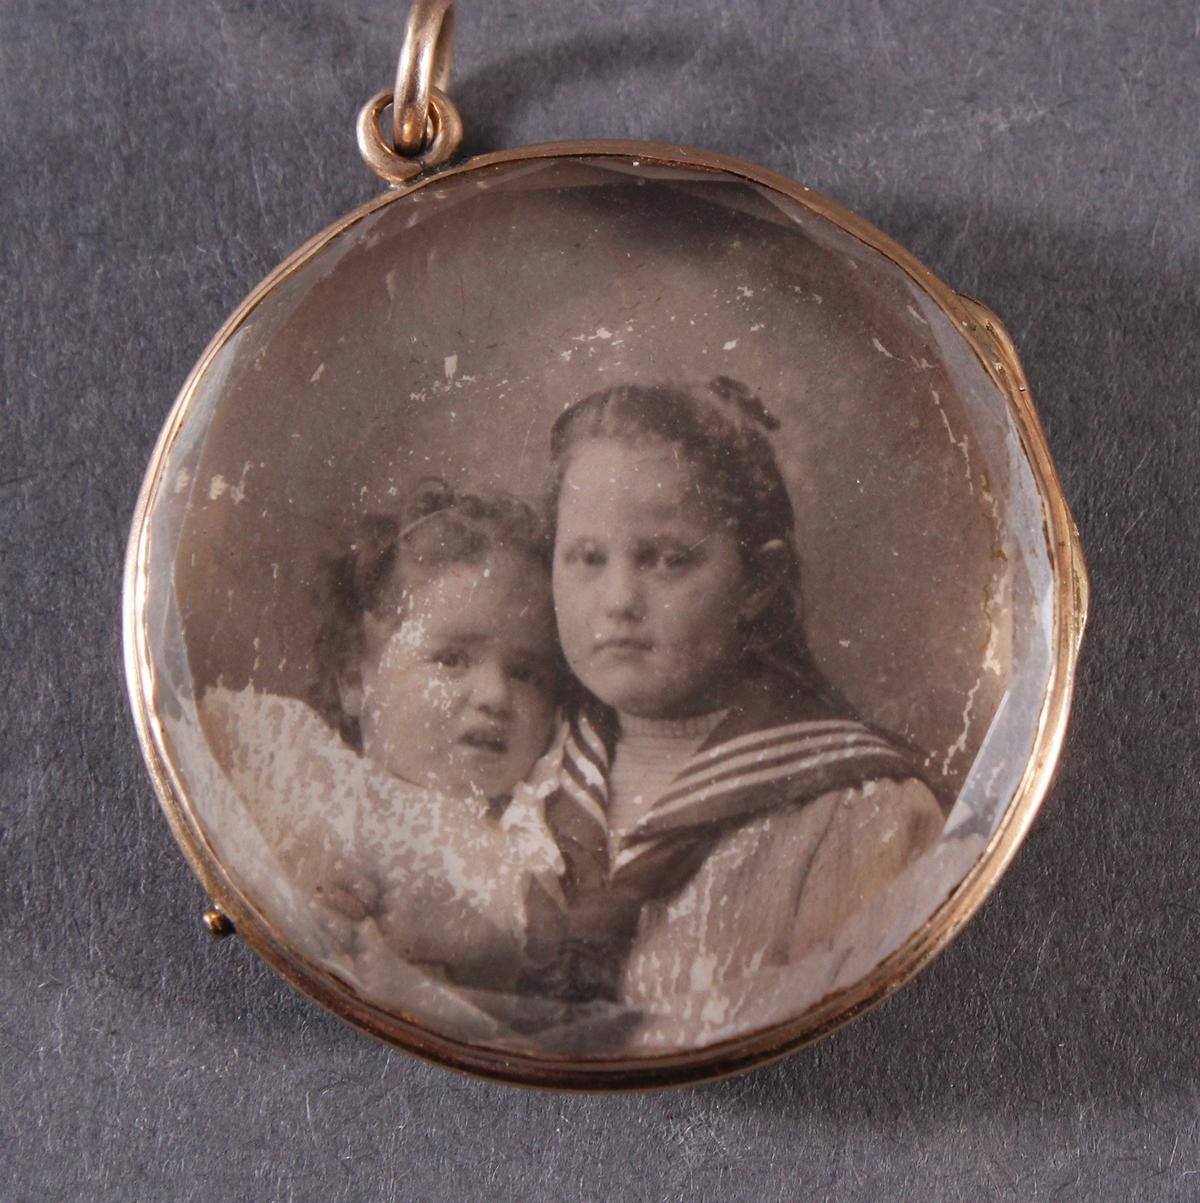 Rundes Medaillon um 1900, 18 kt Gelbgold